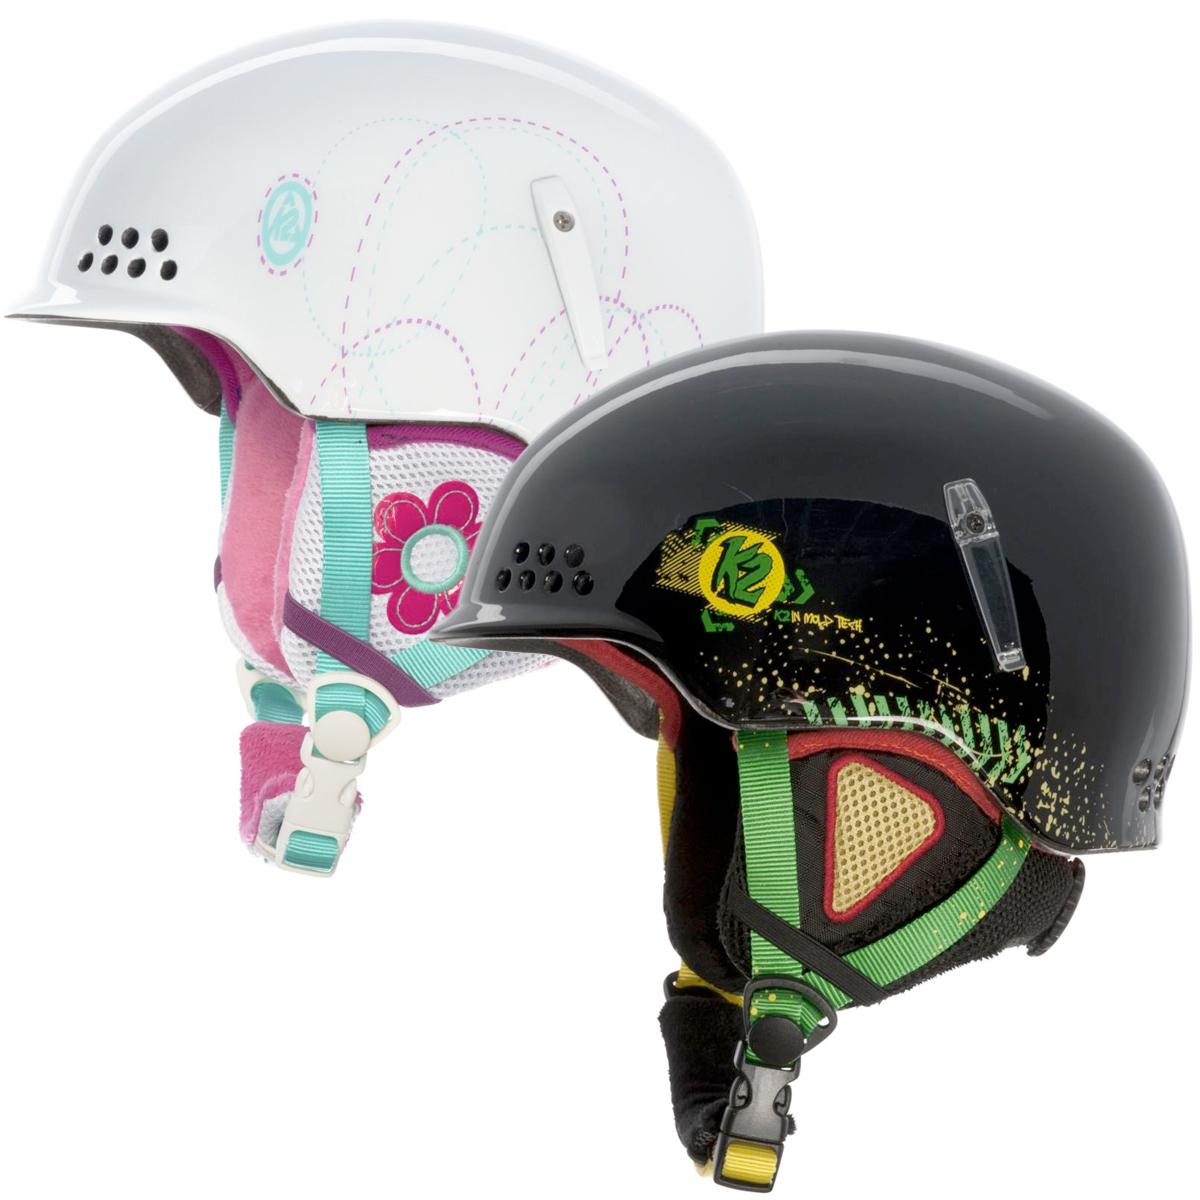 K2 Kids Illusion Ski Snowboard Helmet 2015